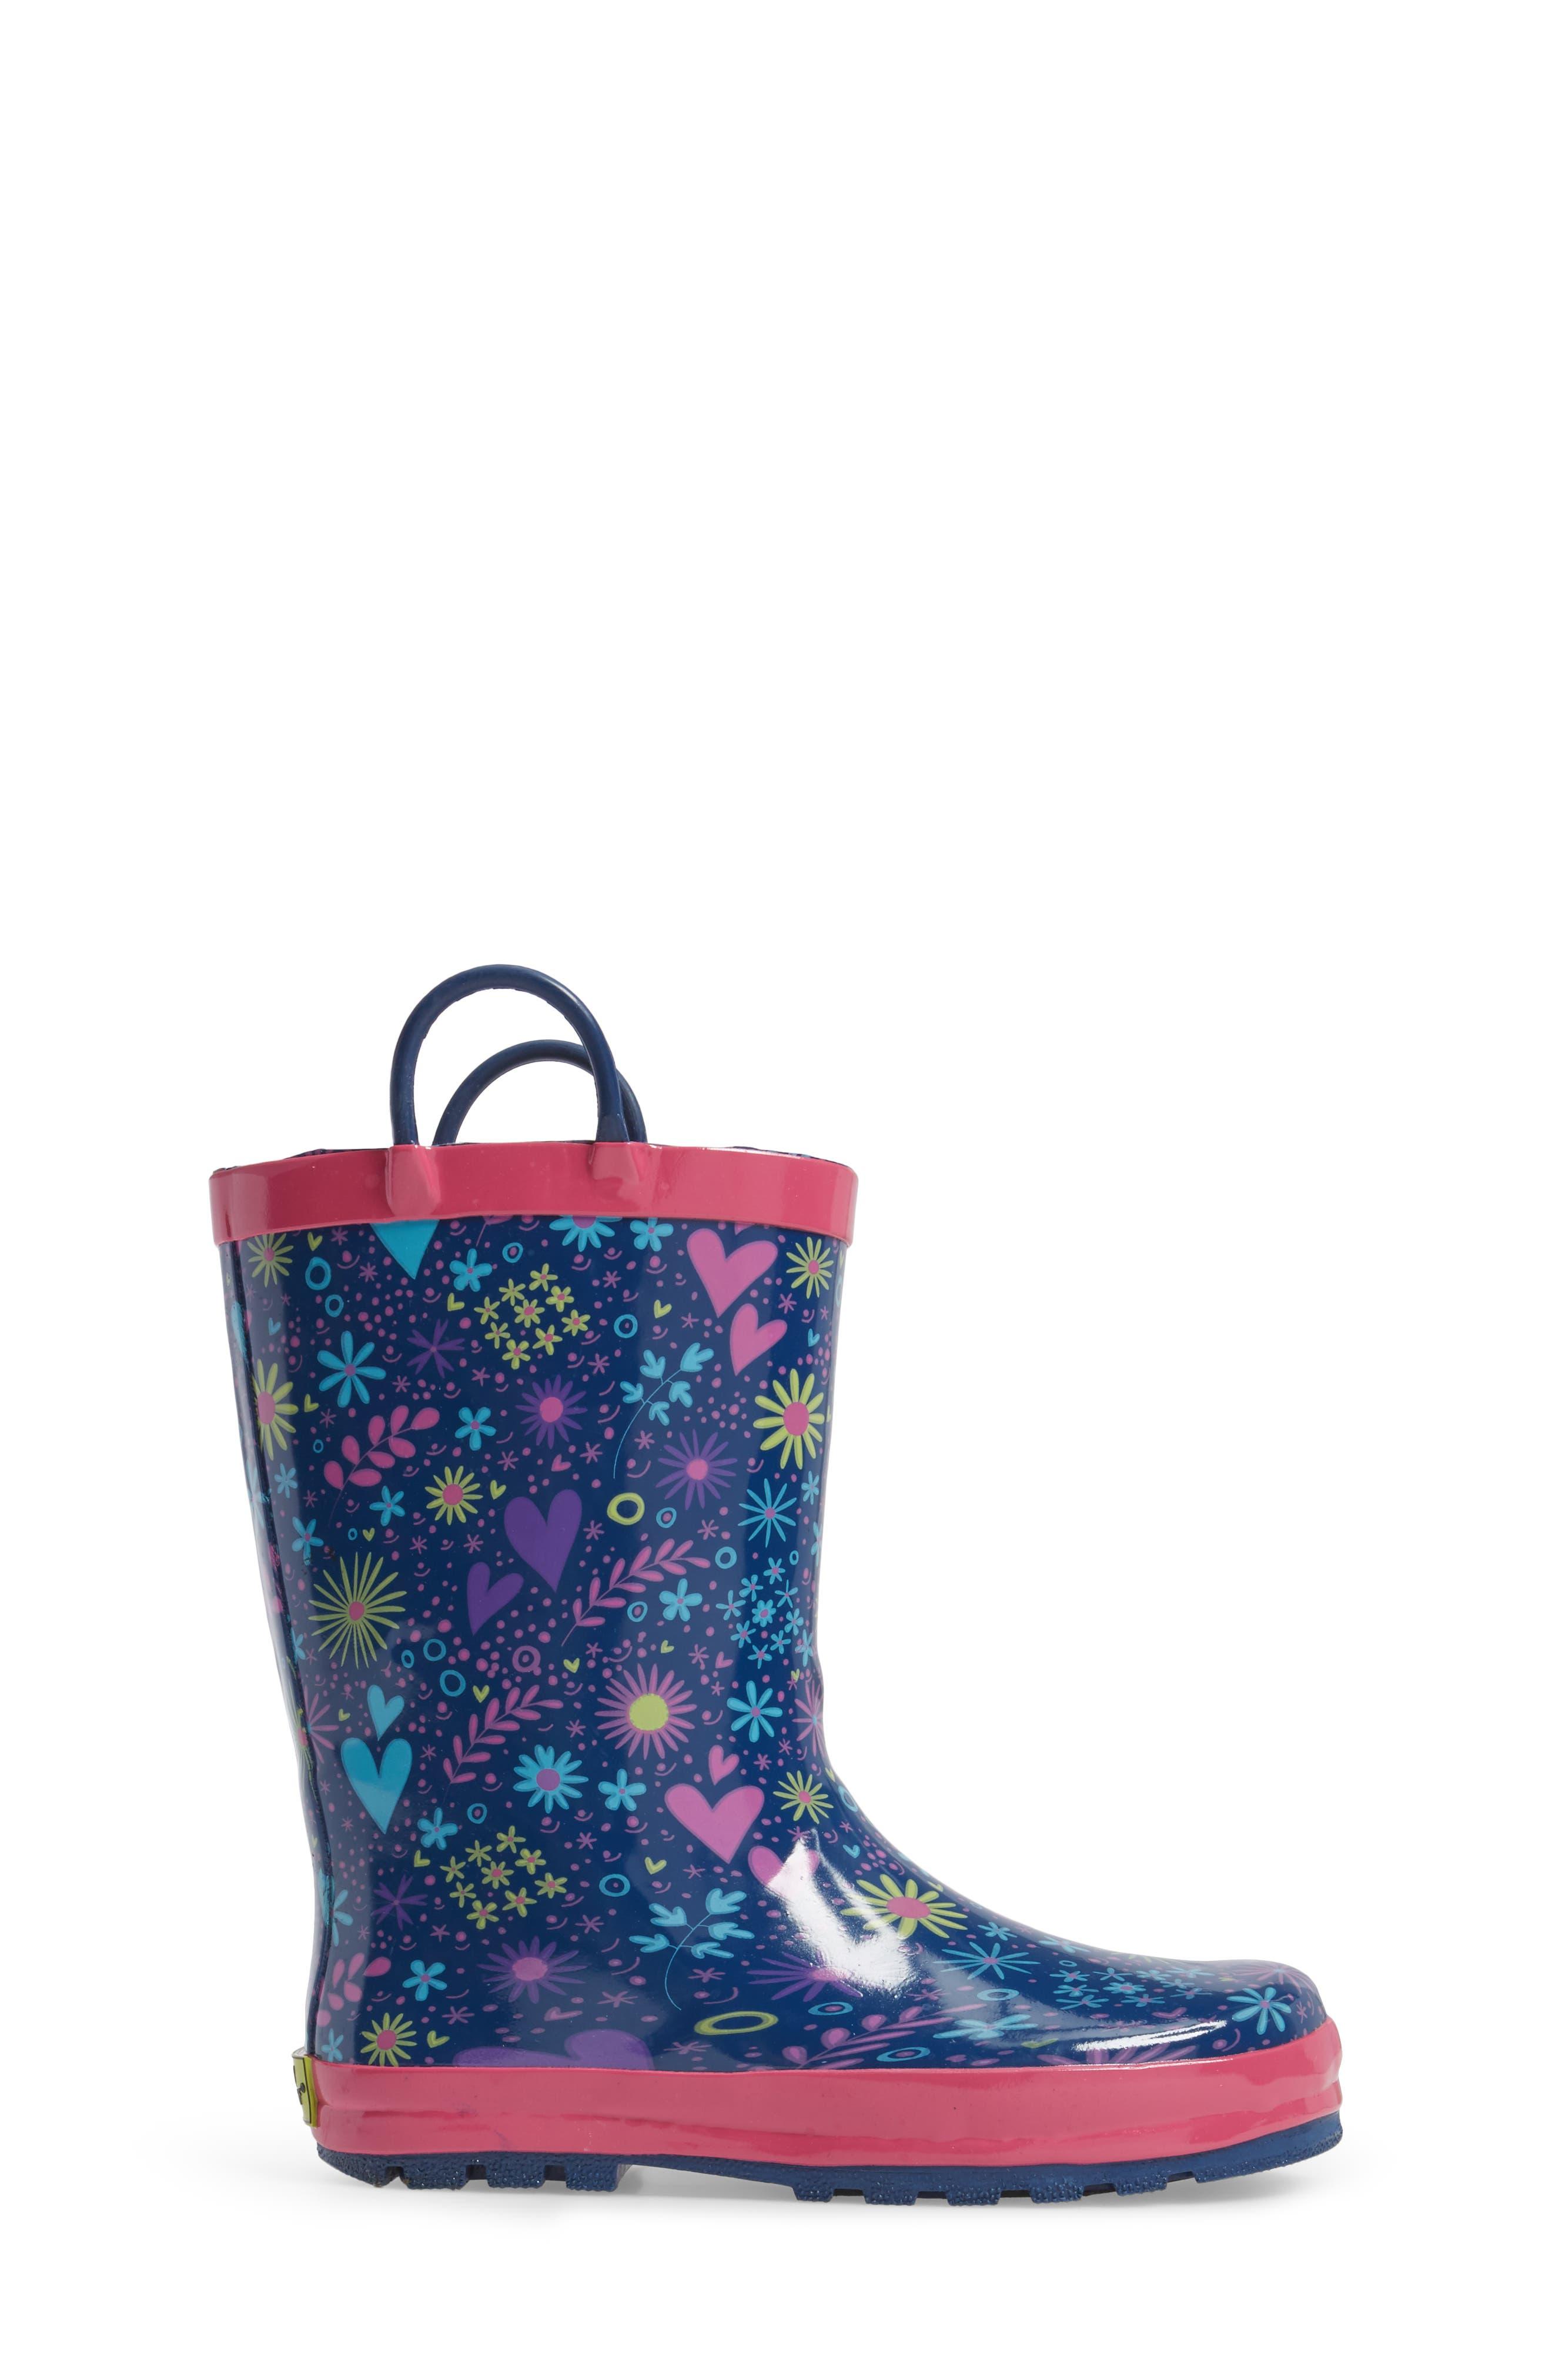 Willow Rain Boot,                             Alternate thumbnail 3, color,                             511